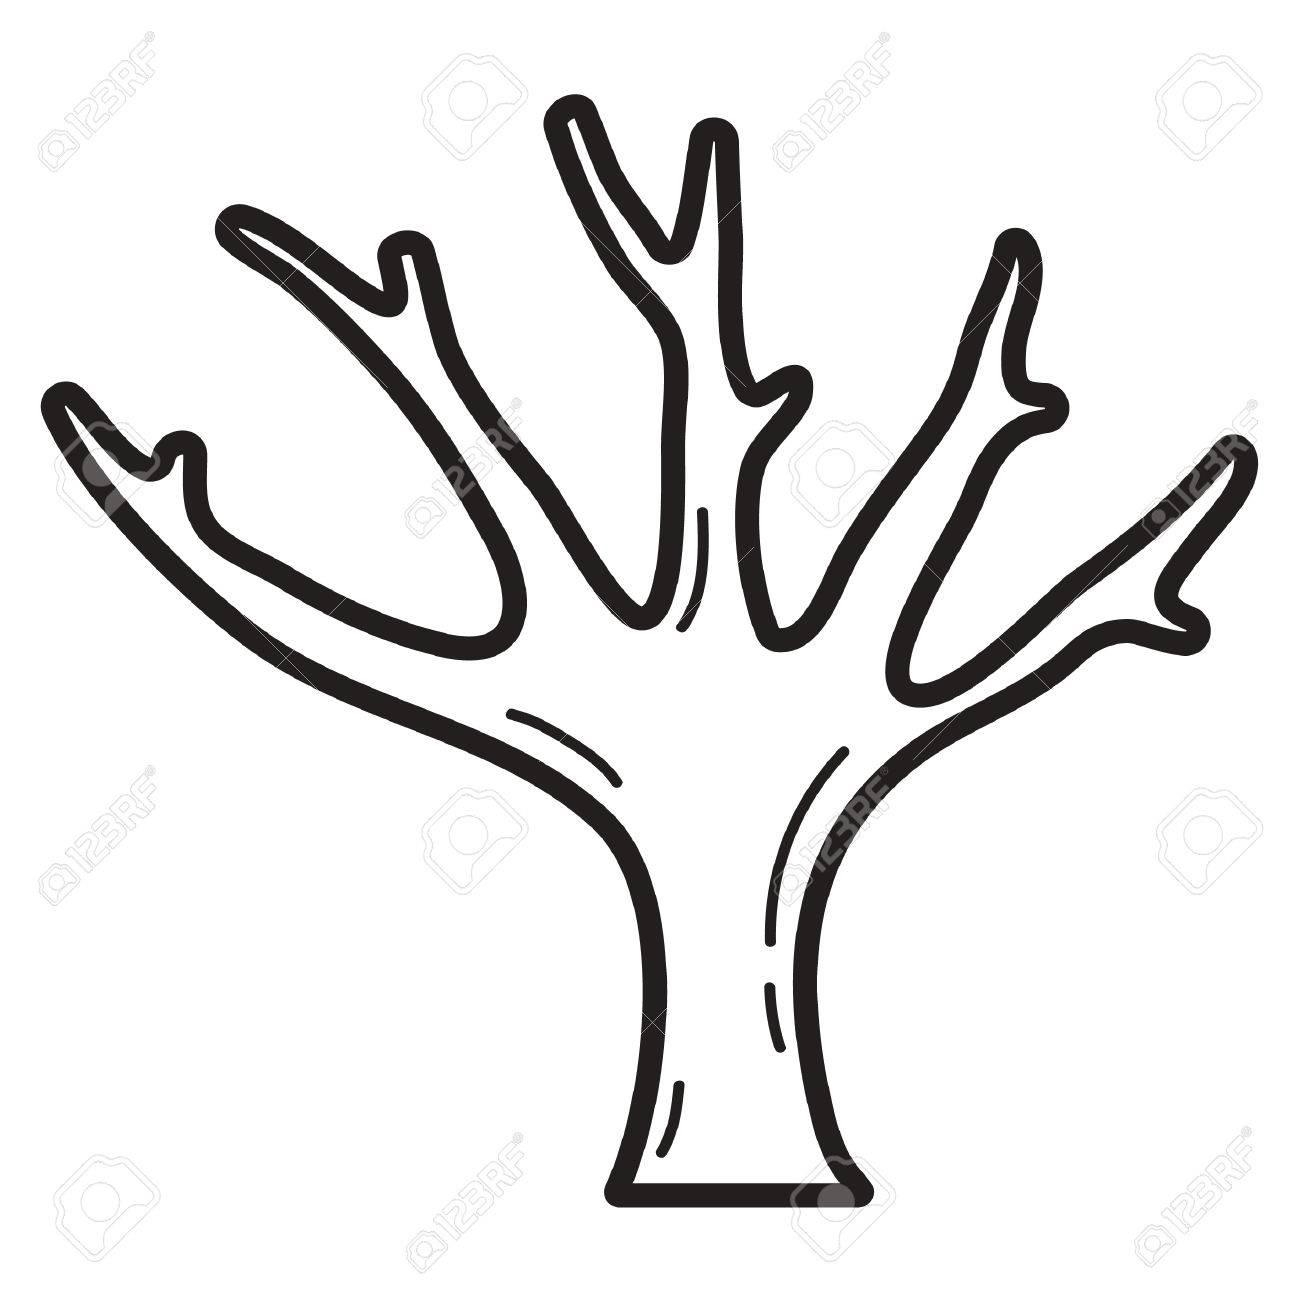 tree - 52930376